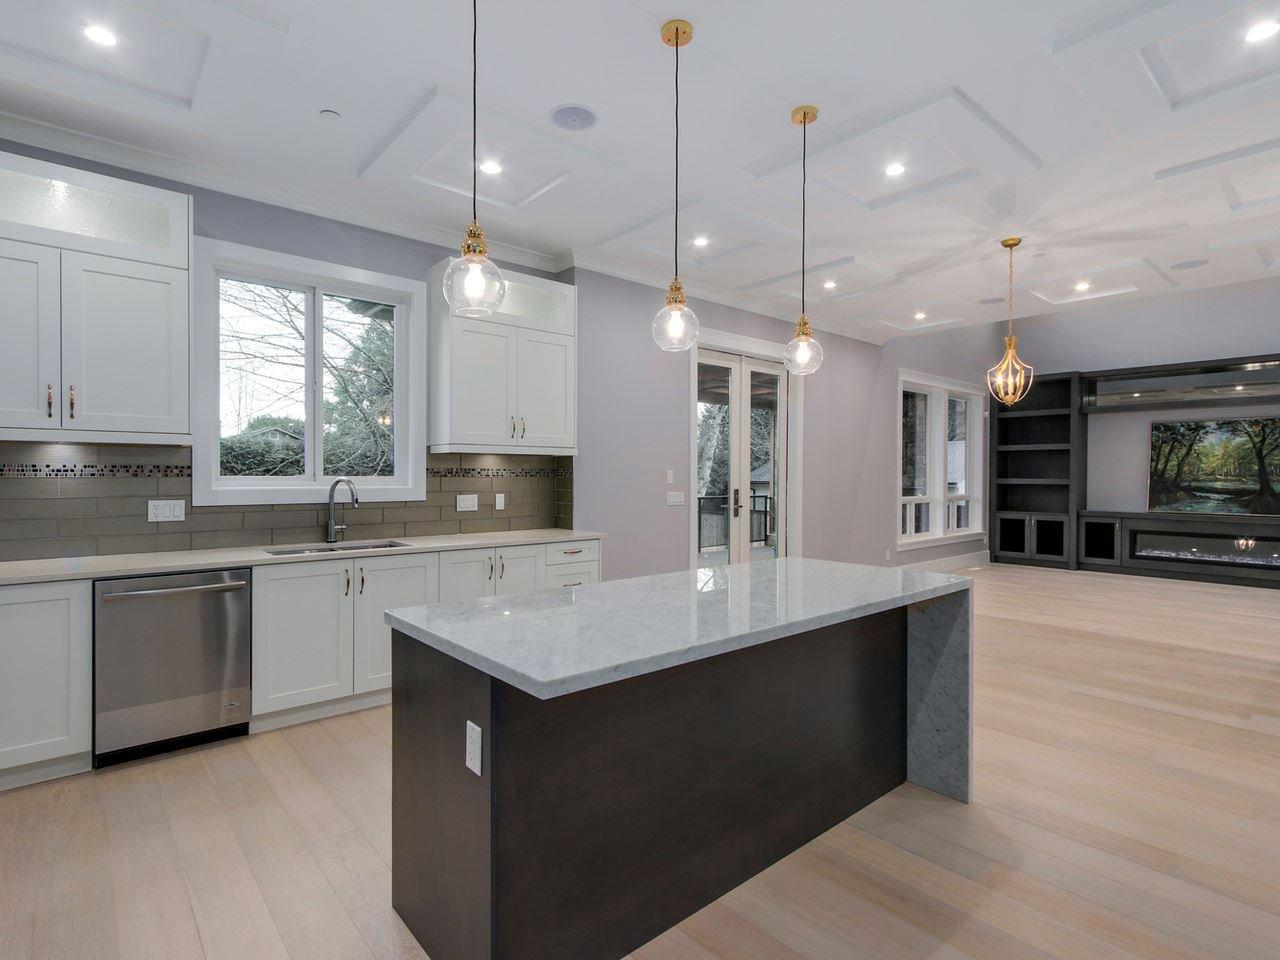 Photo 10: Photos: 1560 MAPLE Street: White Rock House for sale (South Surrey White Rock)  : MLS®# R2138926